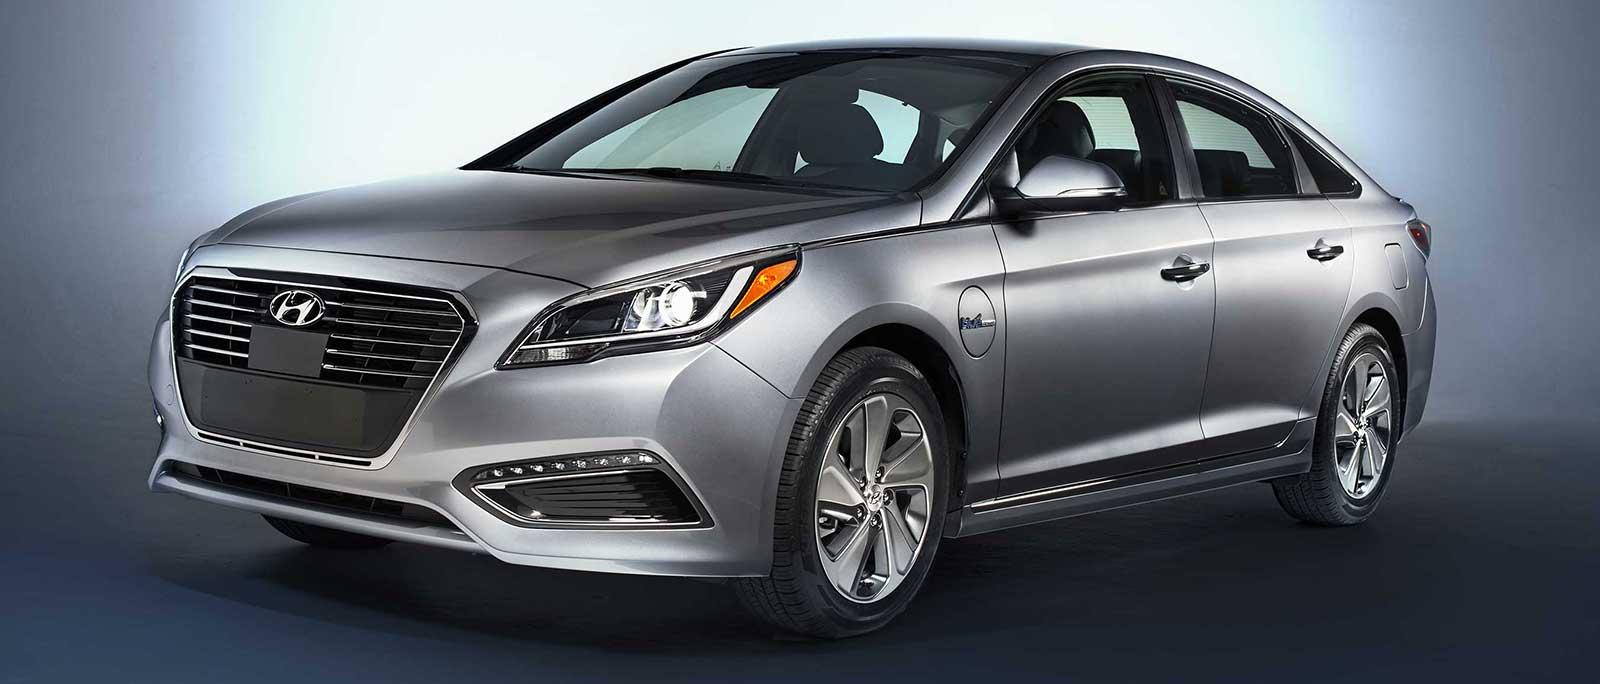 2016 Hyundai Sonata Plug In Hybrid Expected To Deliver 22 Mi All Electric Range